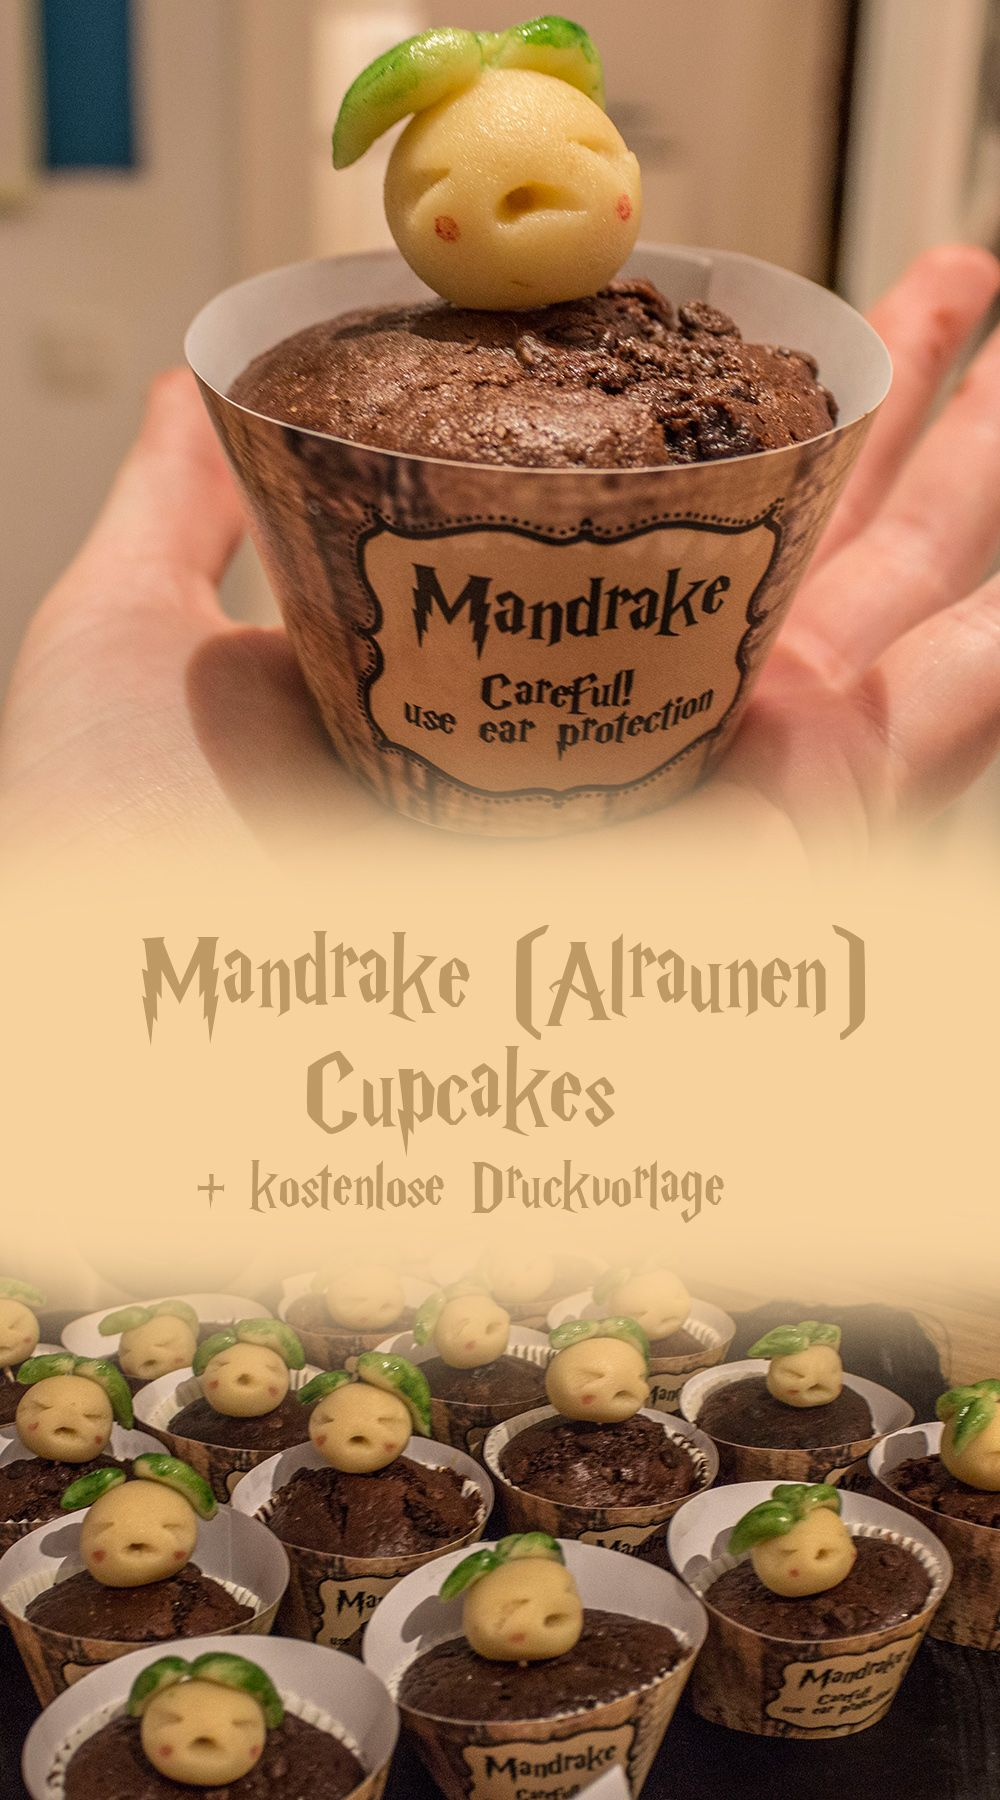 Mandrake (Alraunen) Cupcakes Rezept!! Perfekt für jede Harry Potter Party! Lecker, einfach und super cute! #cupcakesrezepte